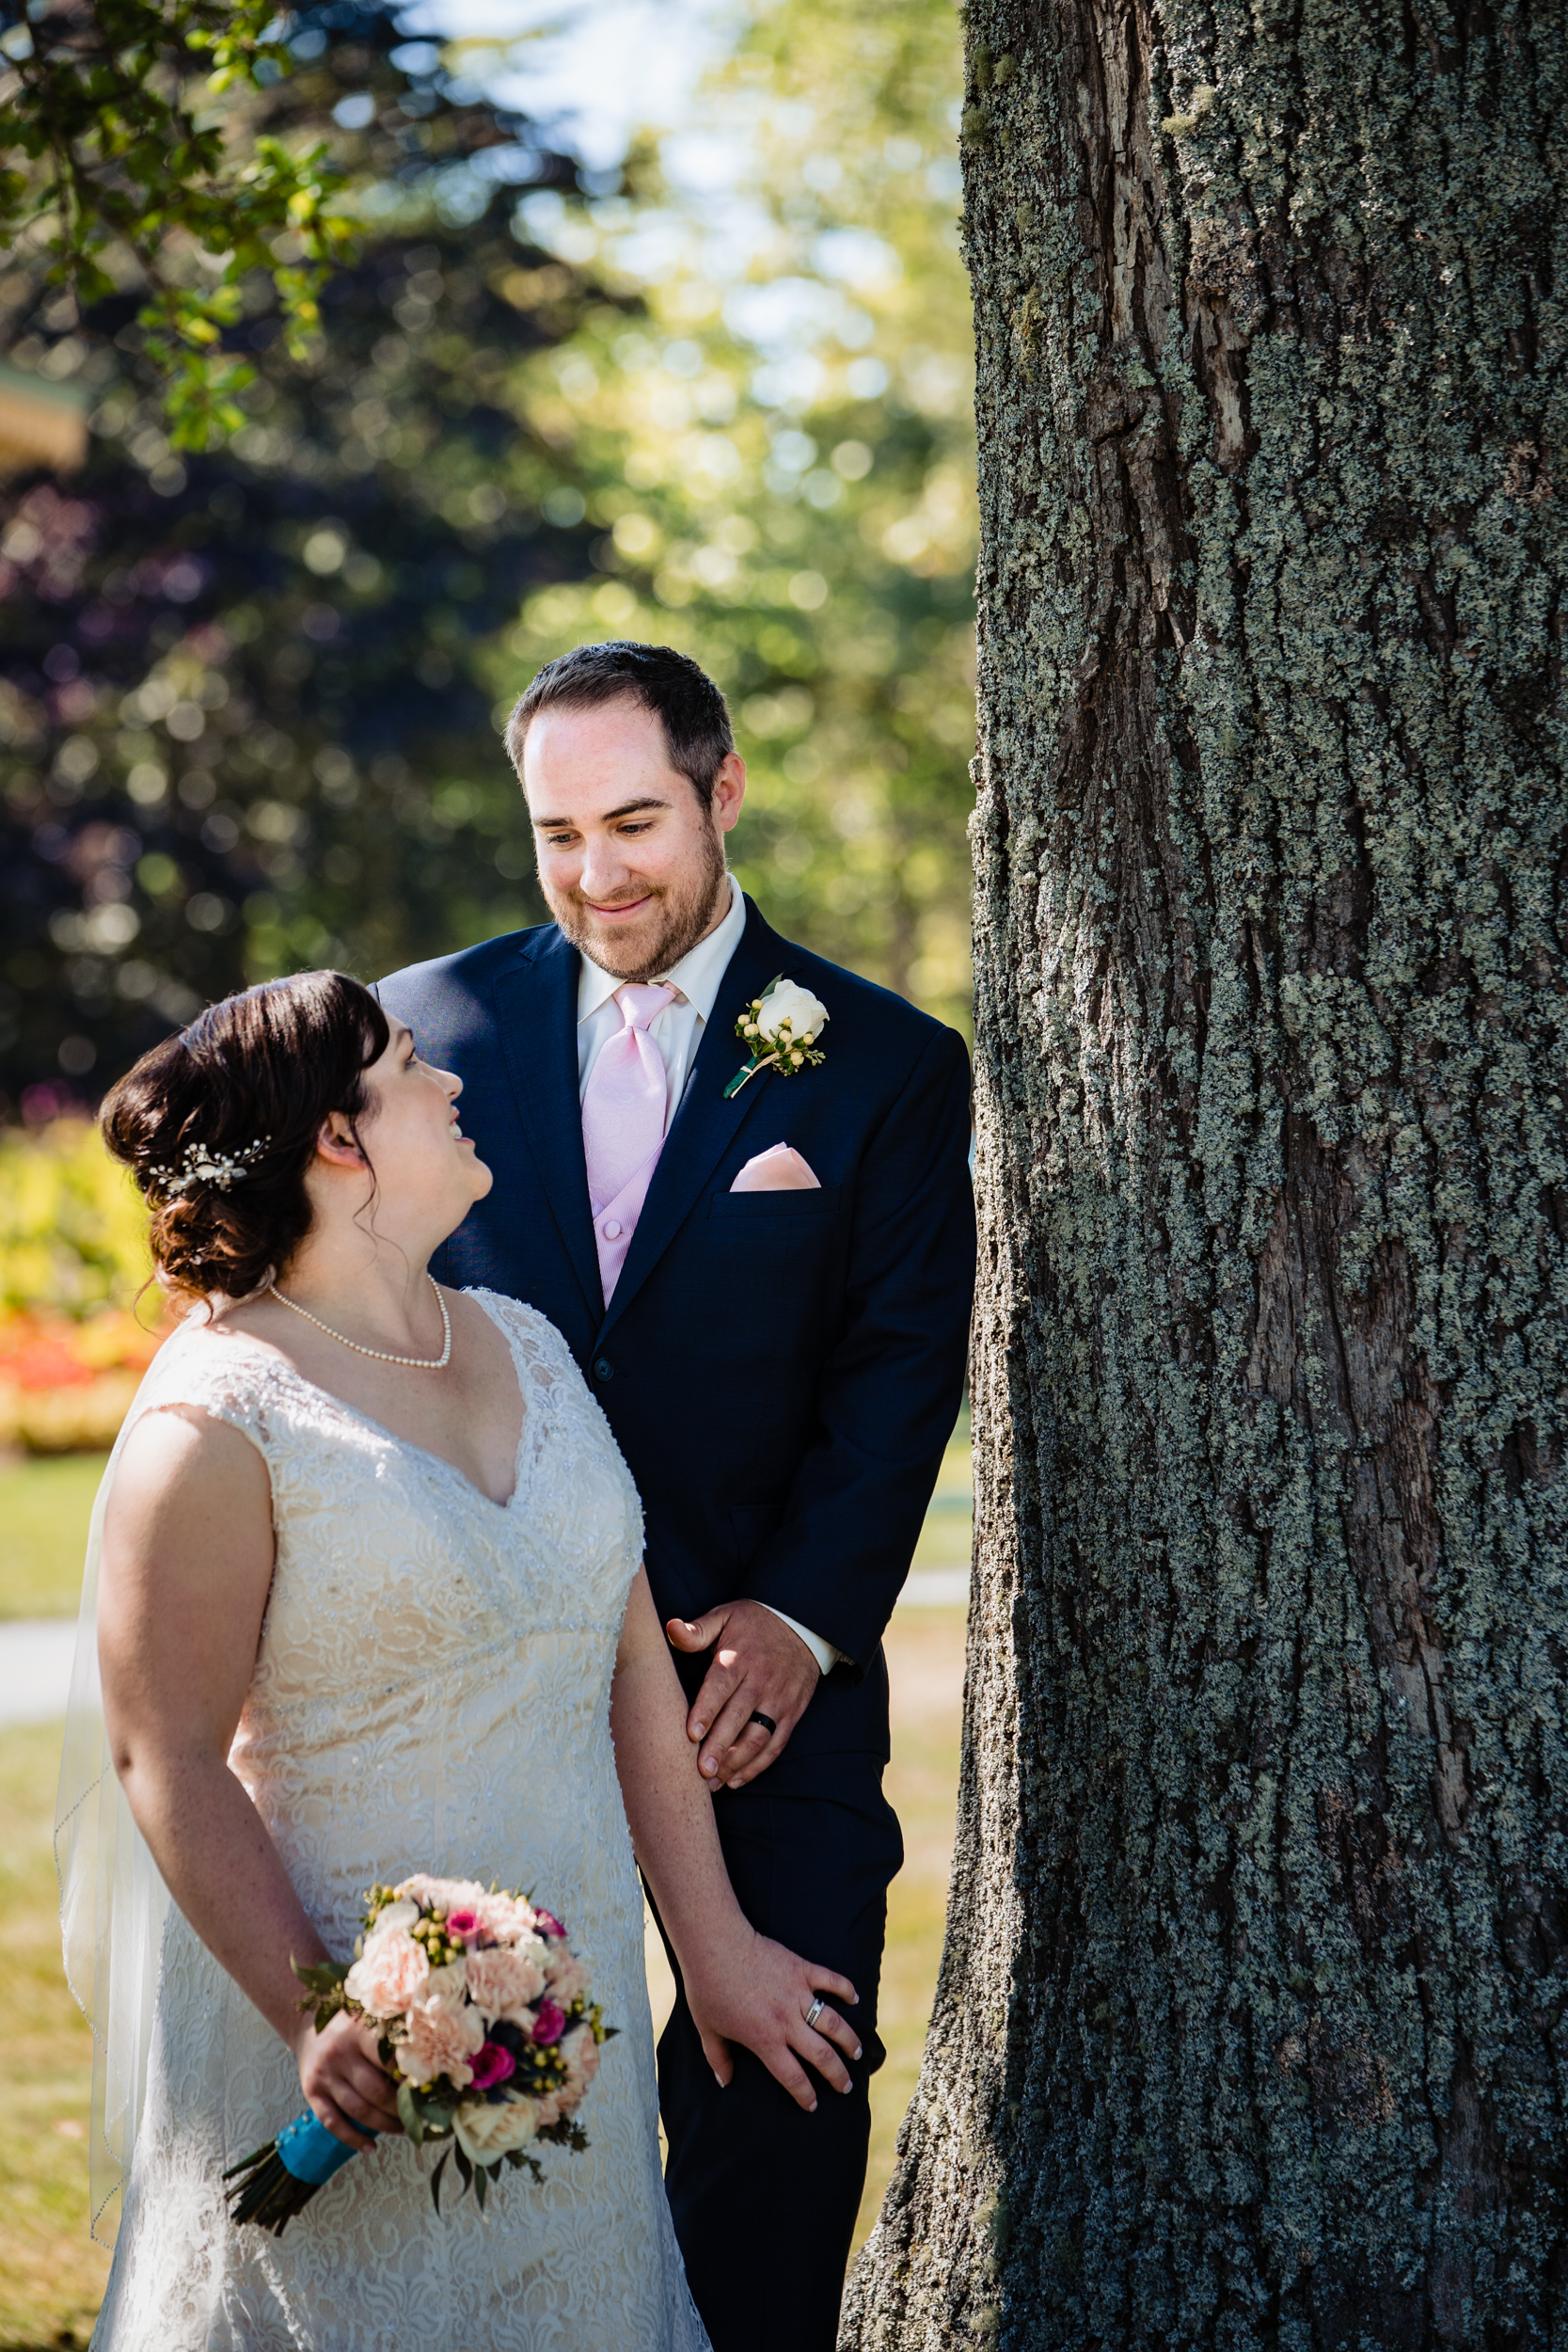 Halifax-wedding-photography-fall-photographers-novascotia-canada-ottawa (64 of 113).jpg